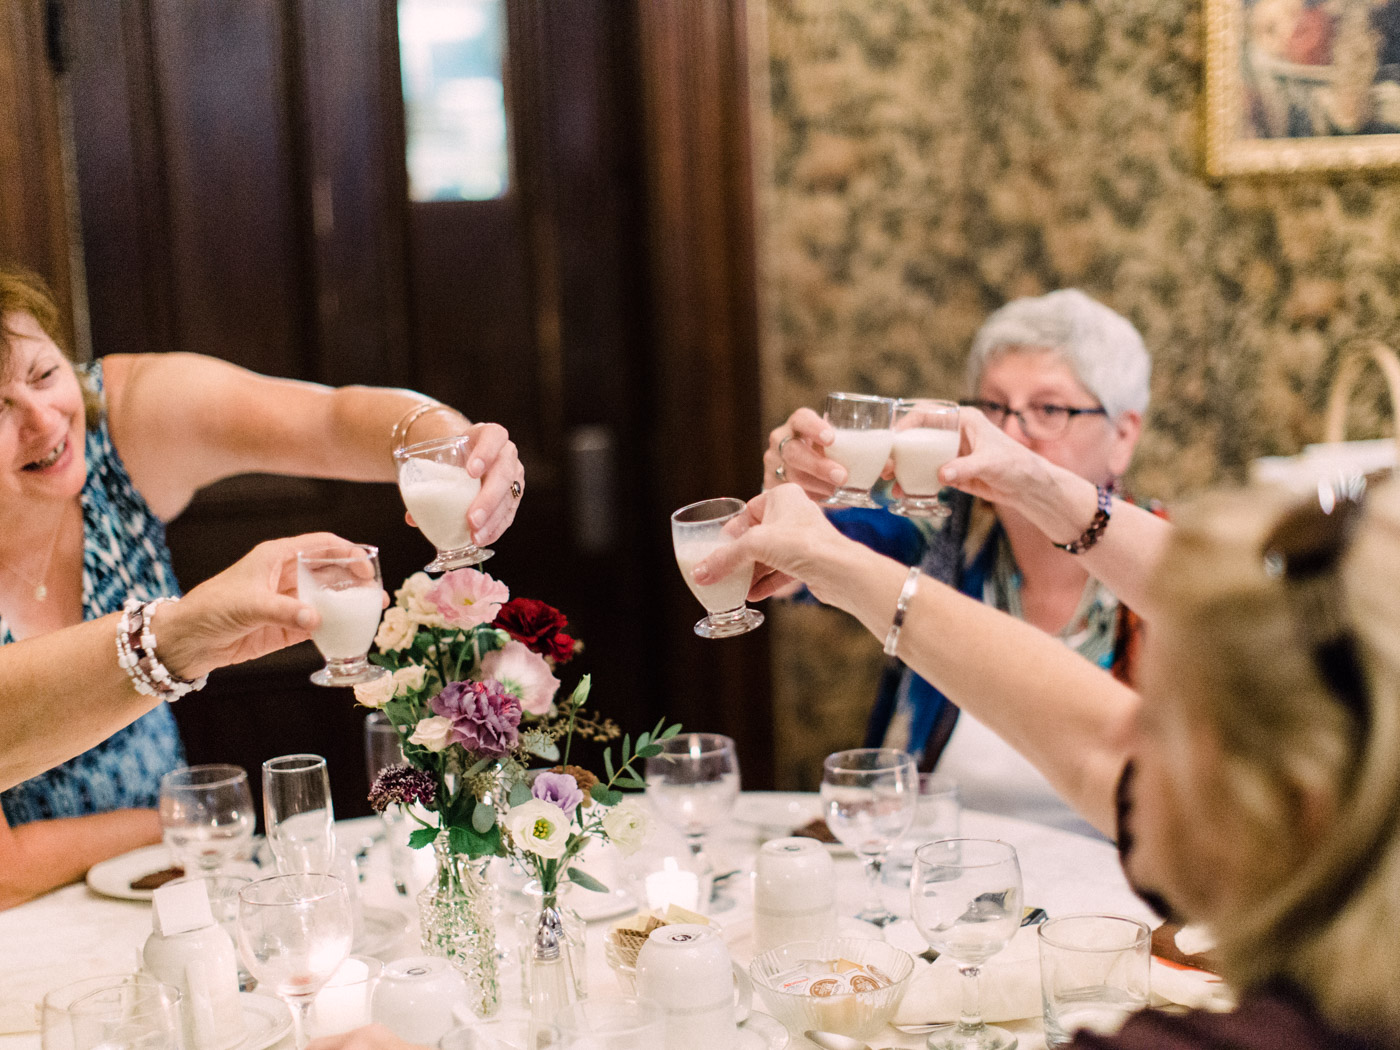 Toronto-wedding-photographer-intimate-classic-fine-art-elopement-ottawa85.jpg